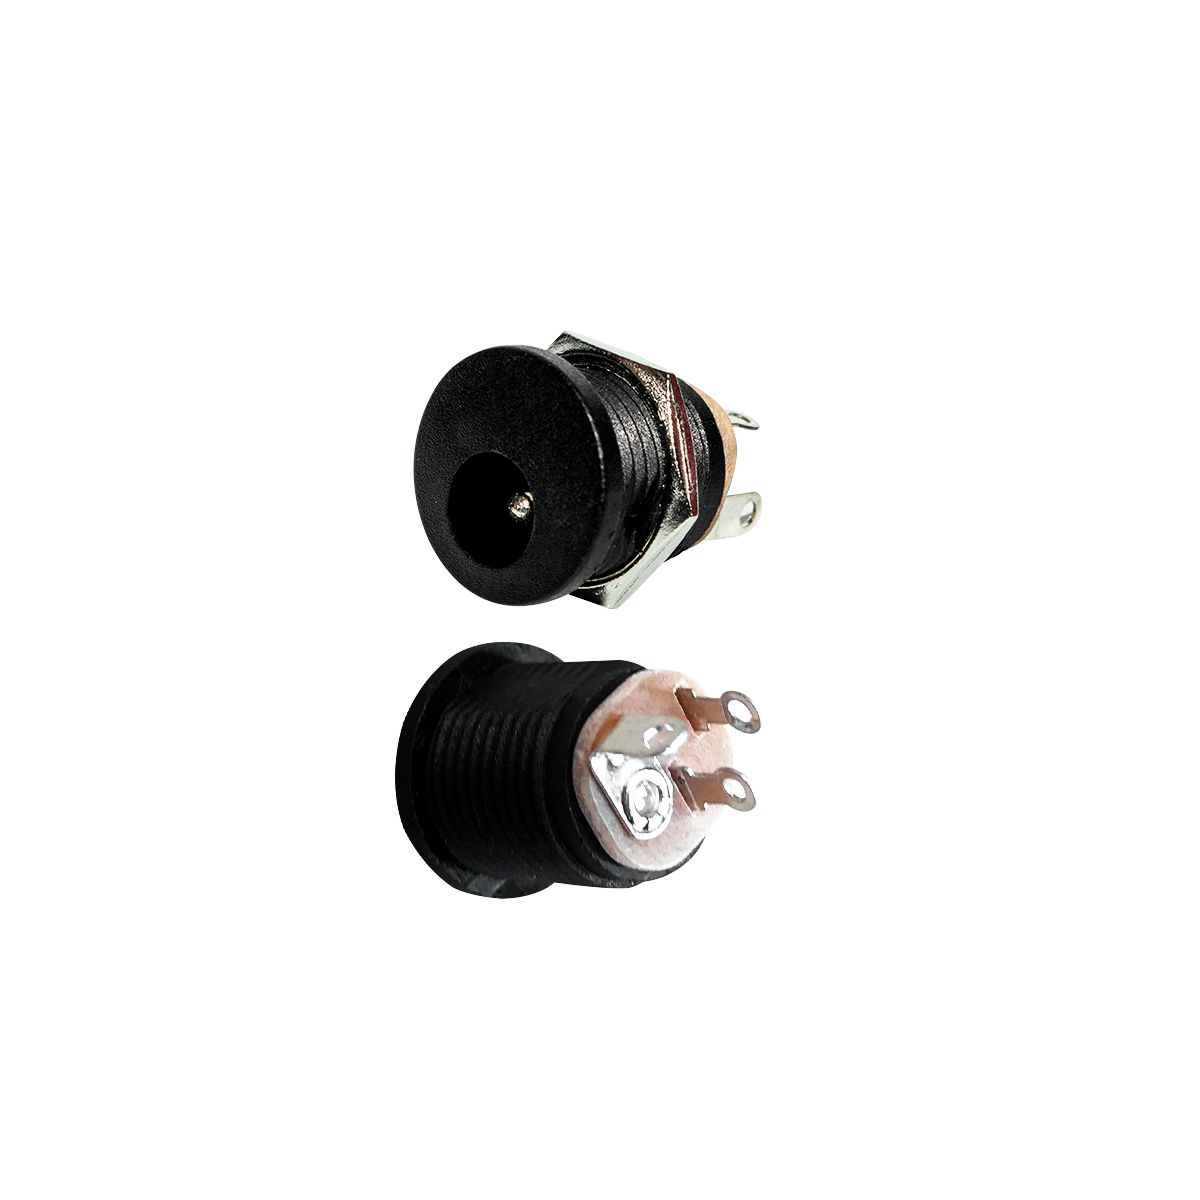 Kit 10 Unidades Conector Plug De Energia P4 Macho + 10 Unidades Plug Jack Tipo P4 Fêmea Com Rosca